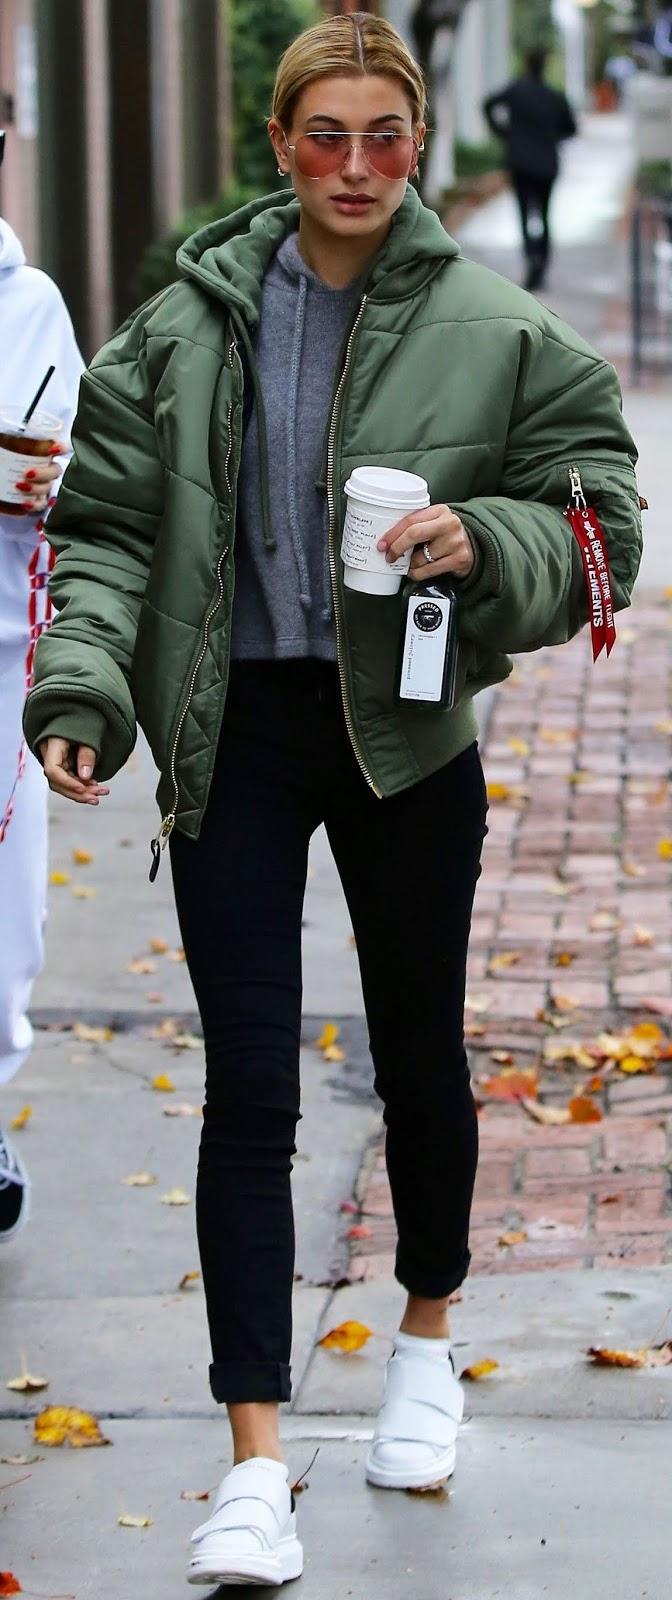 warm outfit to wear this winter / green jacket + hoodie + skinnies + sneakers